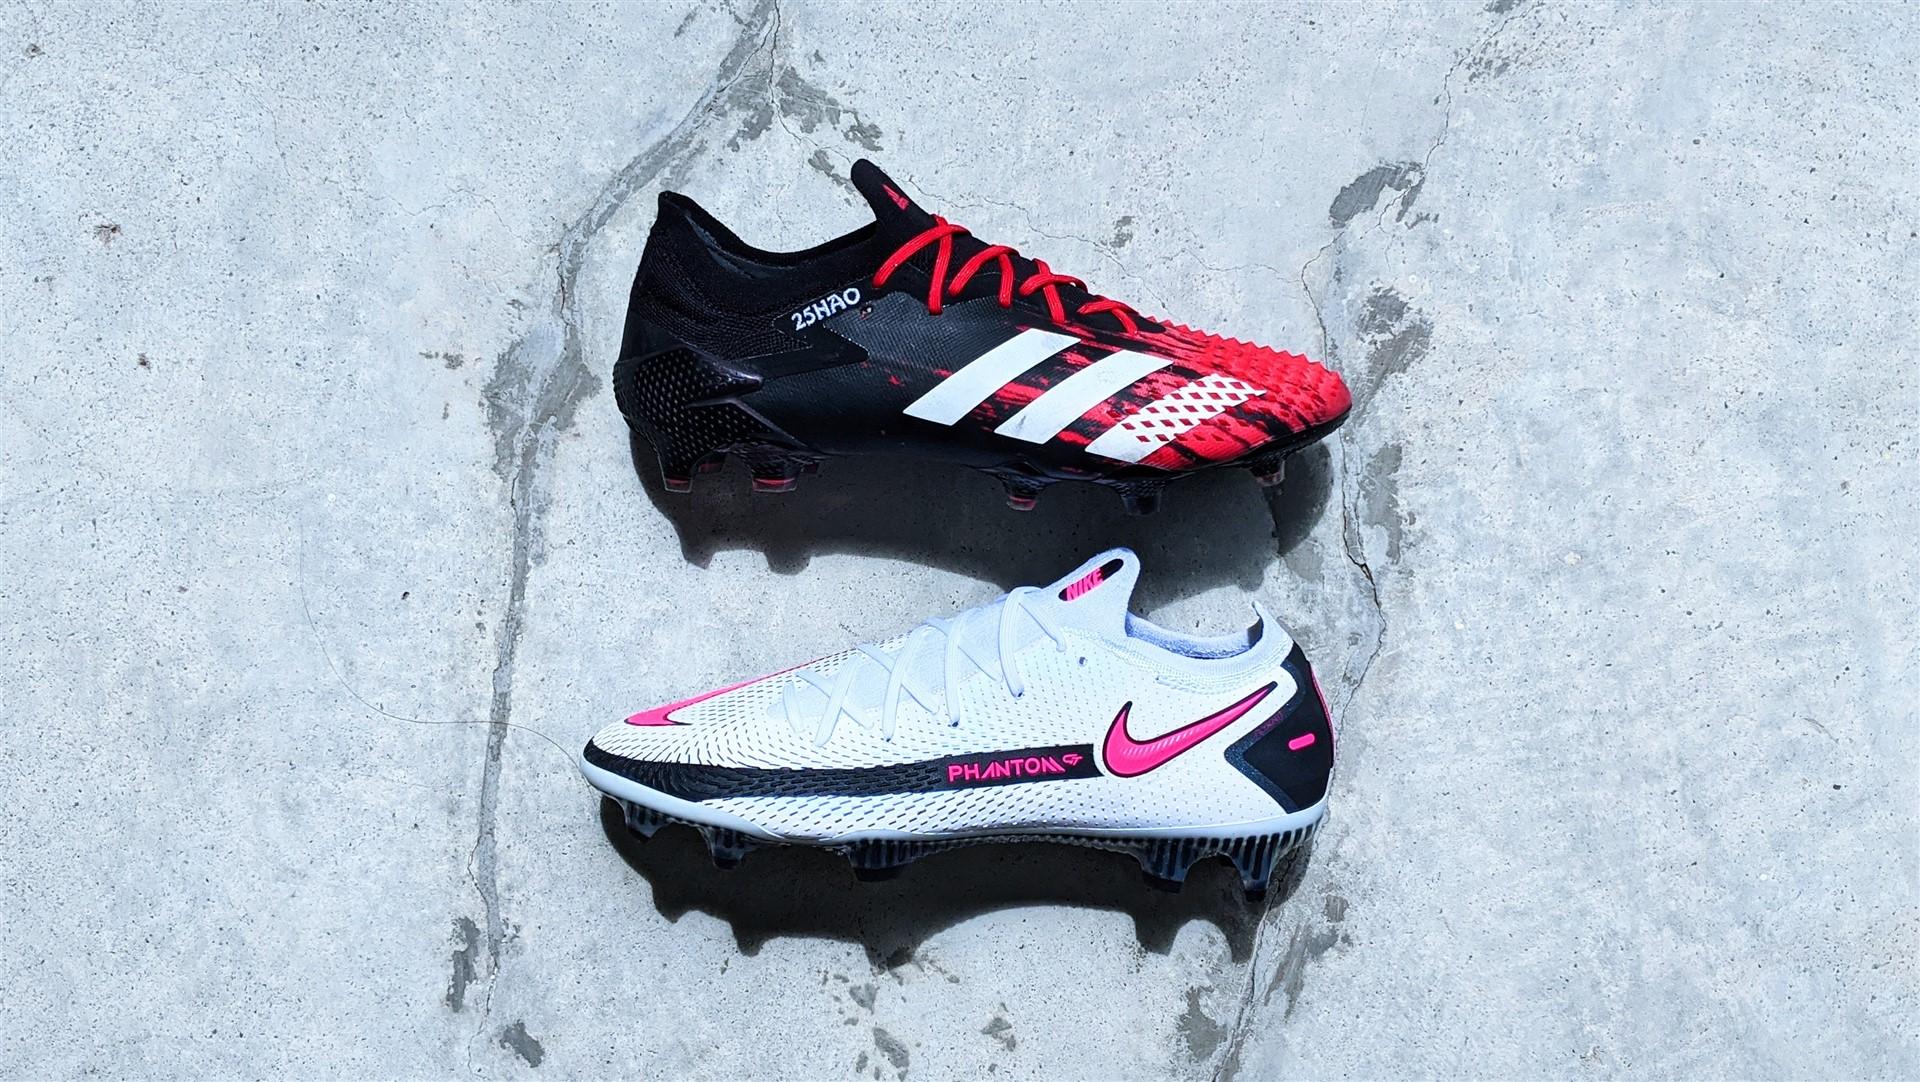 adidas predator vs nike phantom gt football boots soccer cleats review